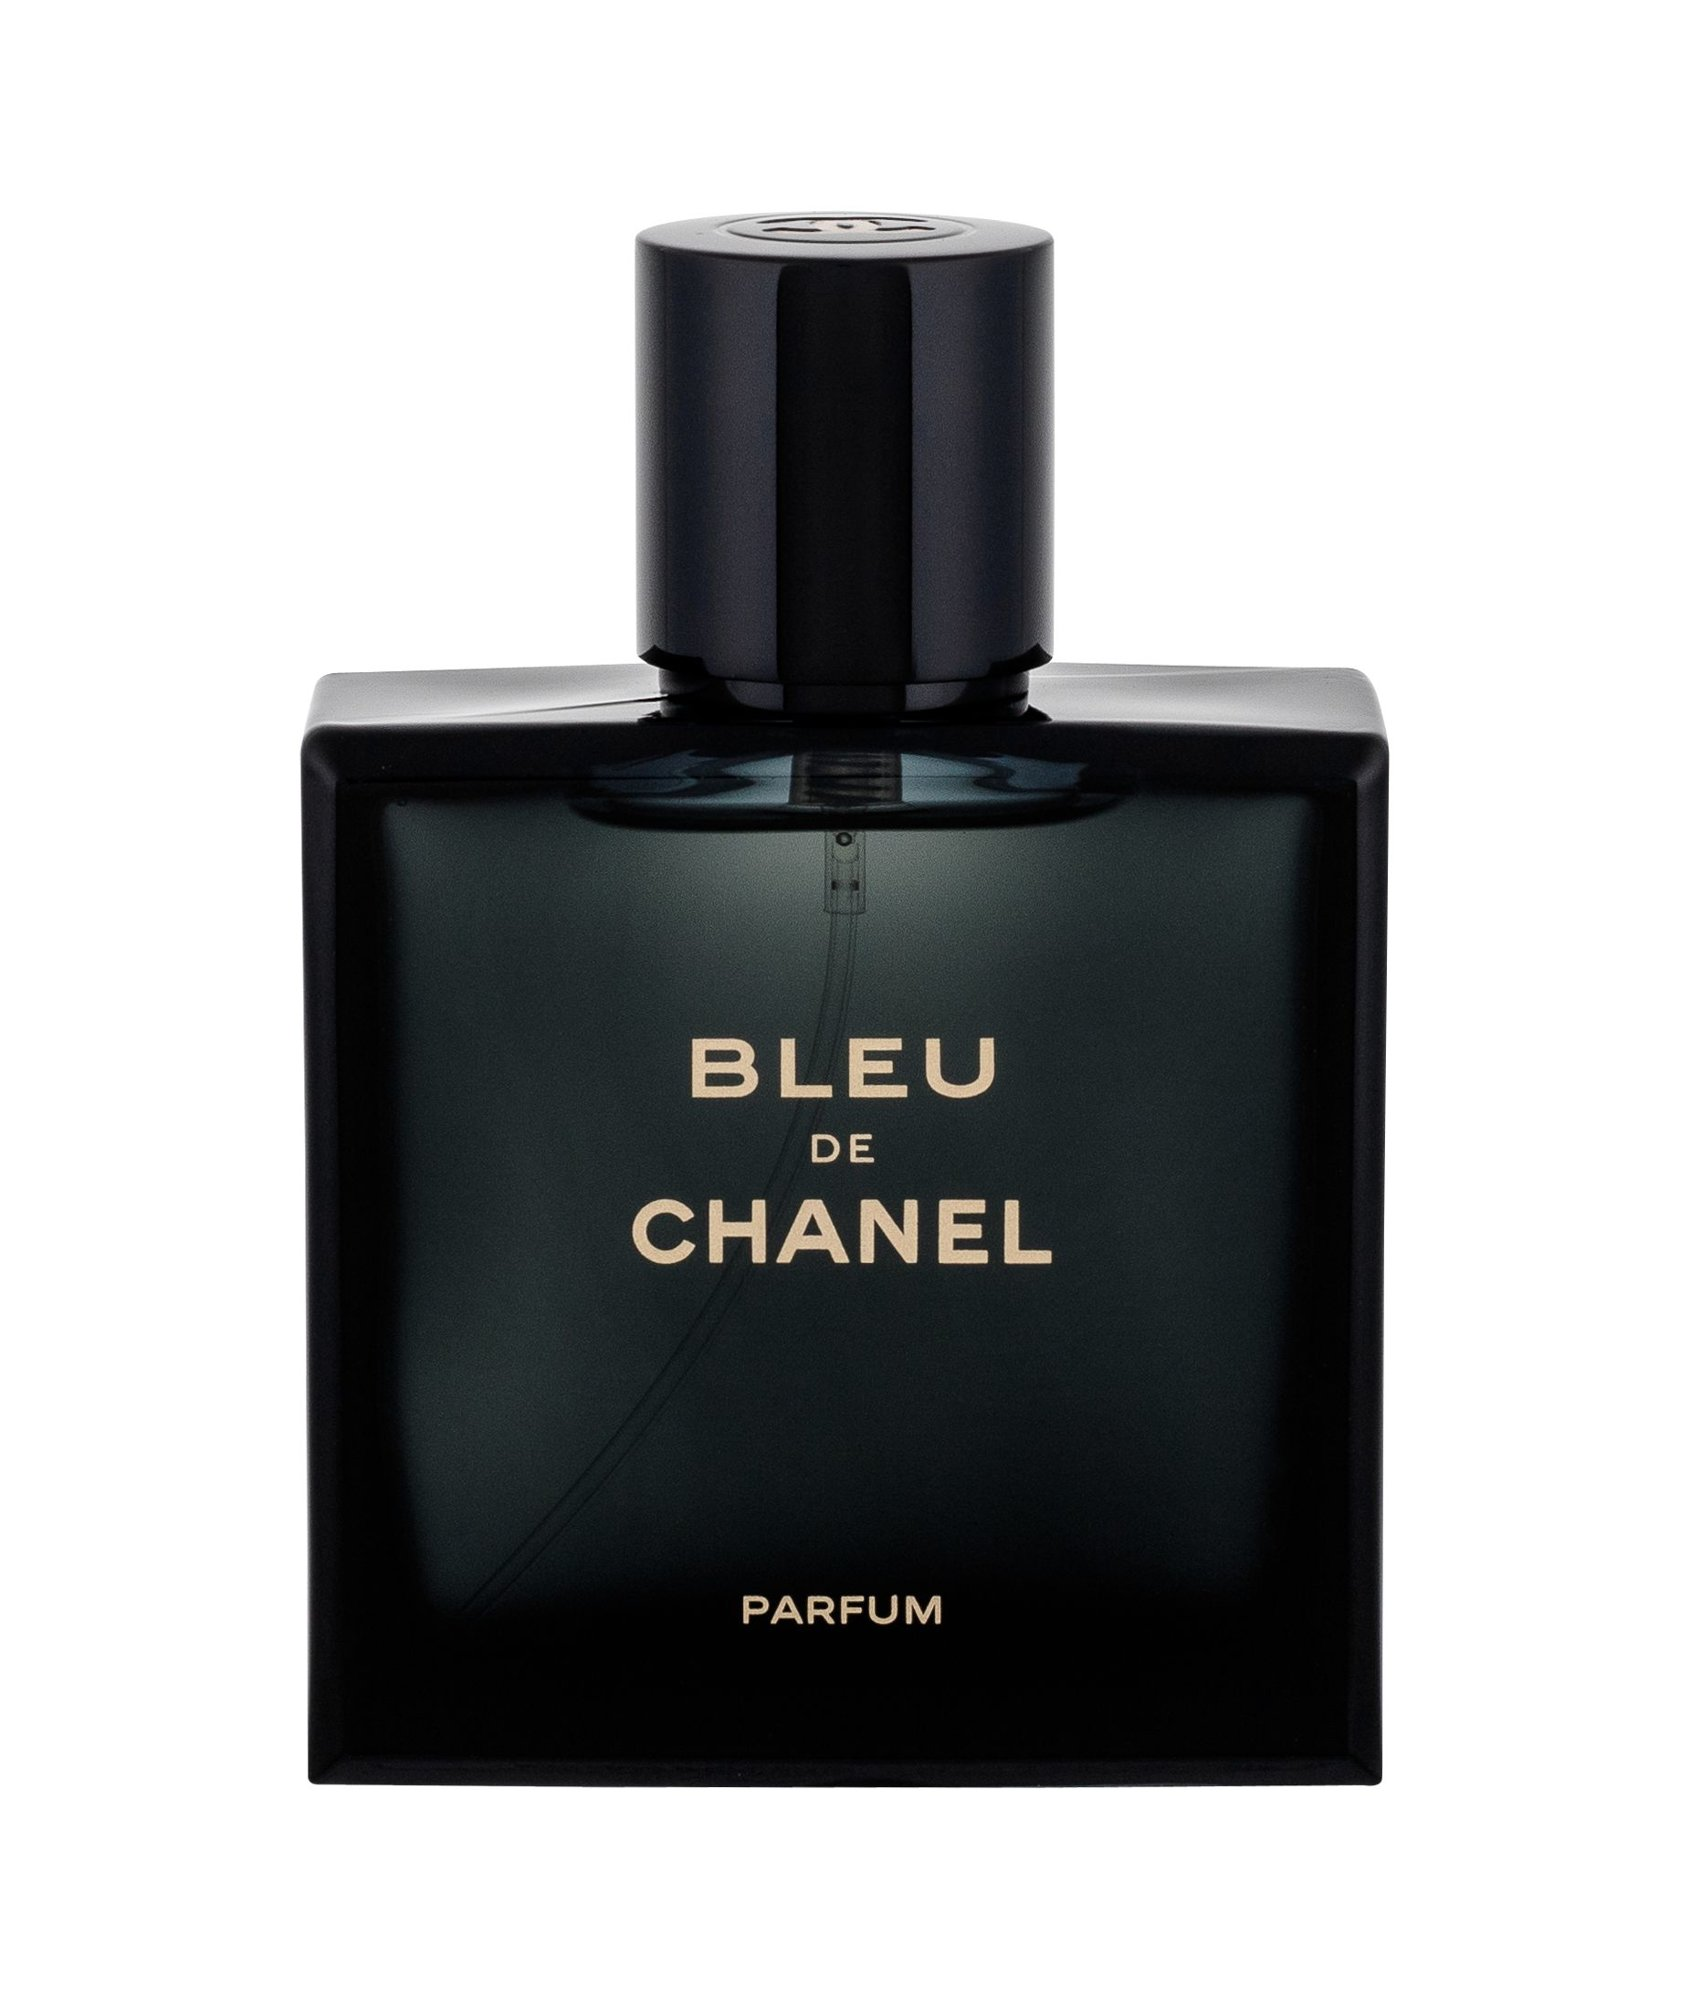 Chanel Bleu de Chanel Perfume 50ml